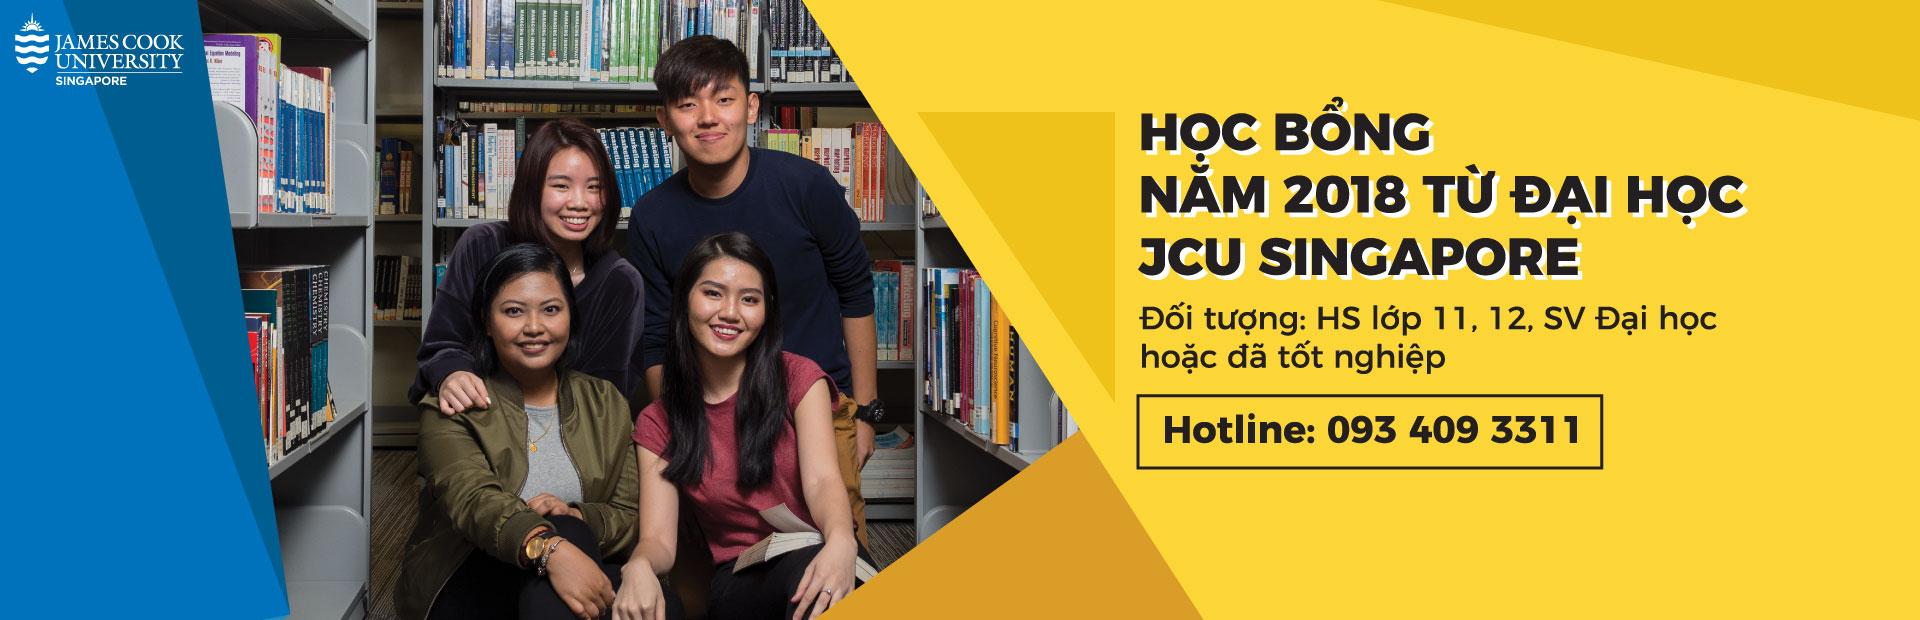 JCU thi hoc bong